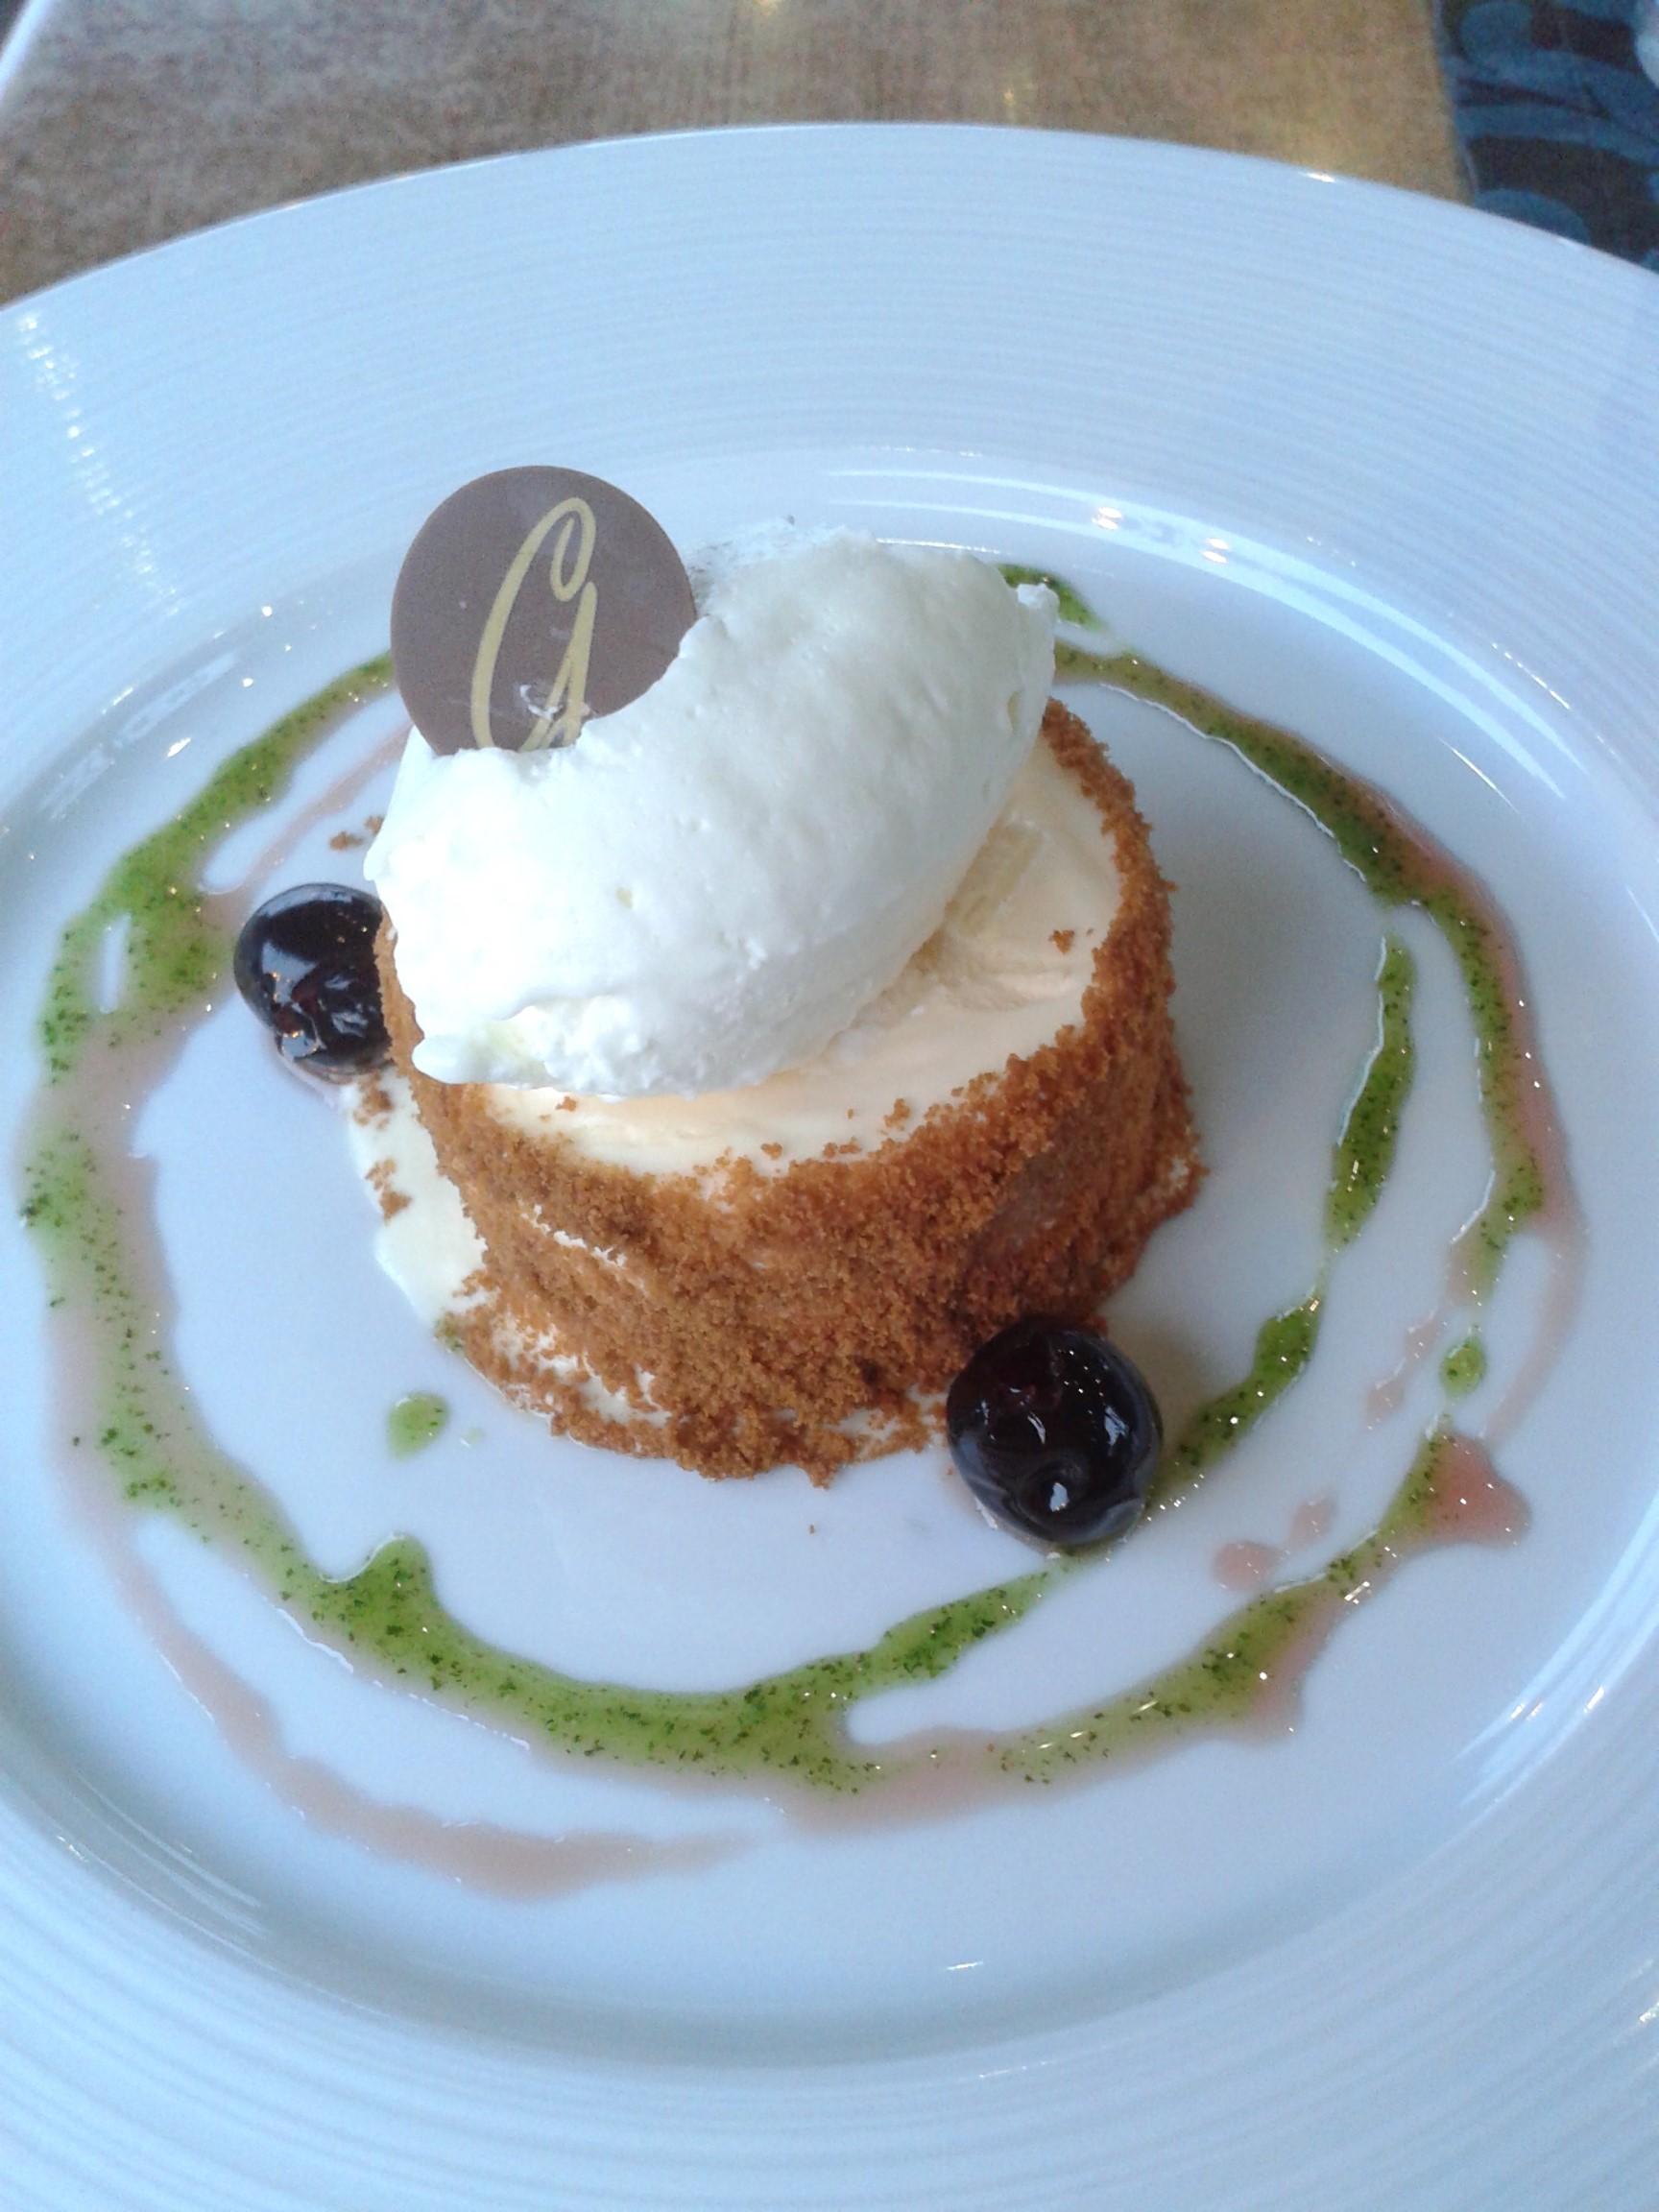 Gerardushoeve restaurant Epen nabij mechelen limburg – dessert